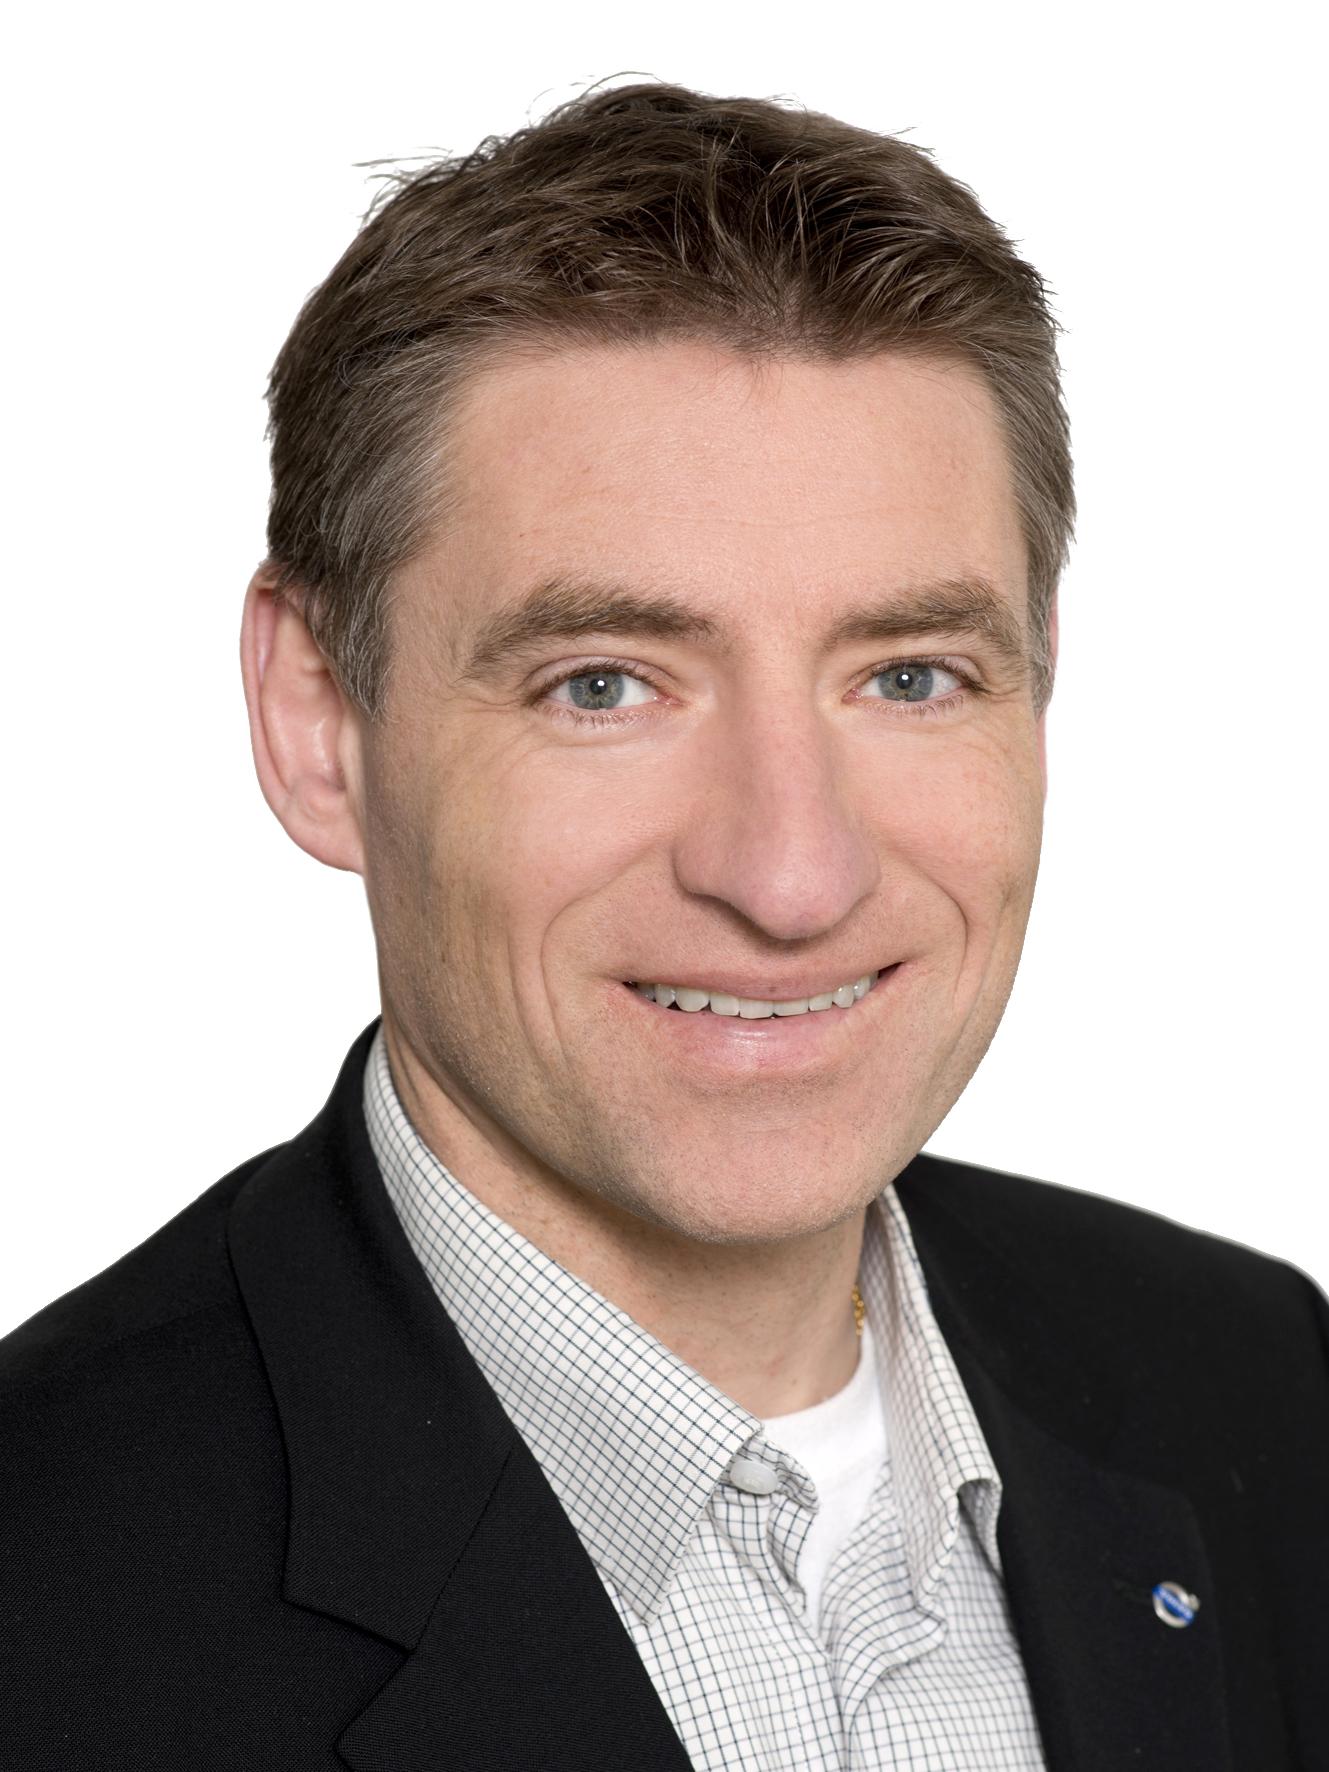 Peter Setterberg